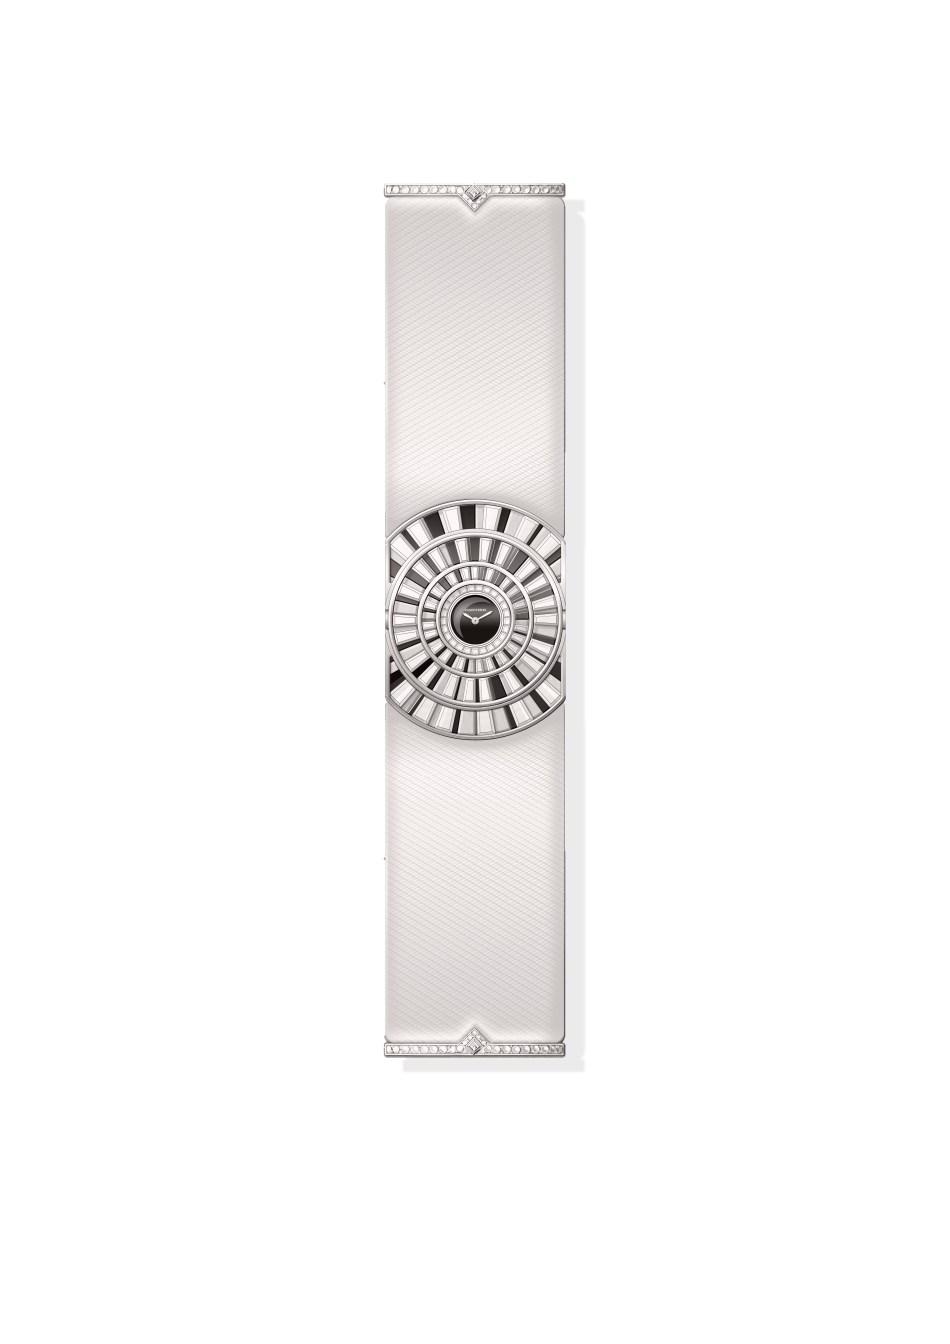 Cartier Libre Bagnoire Infinie